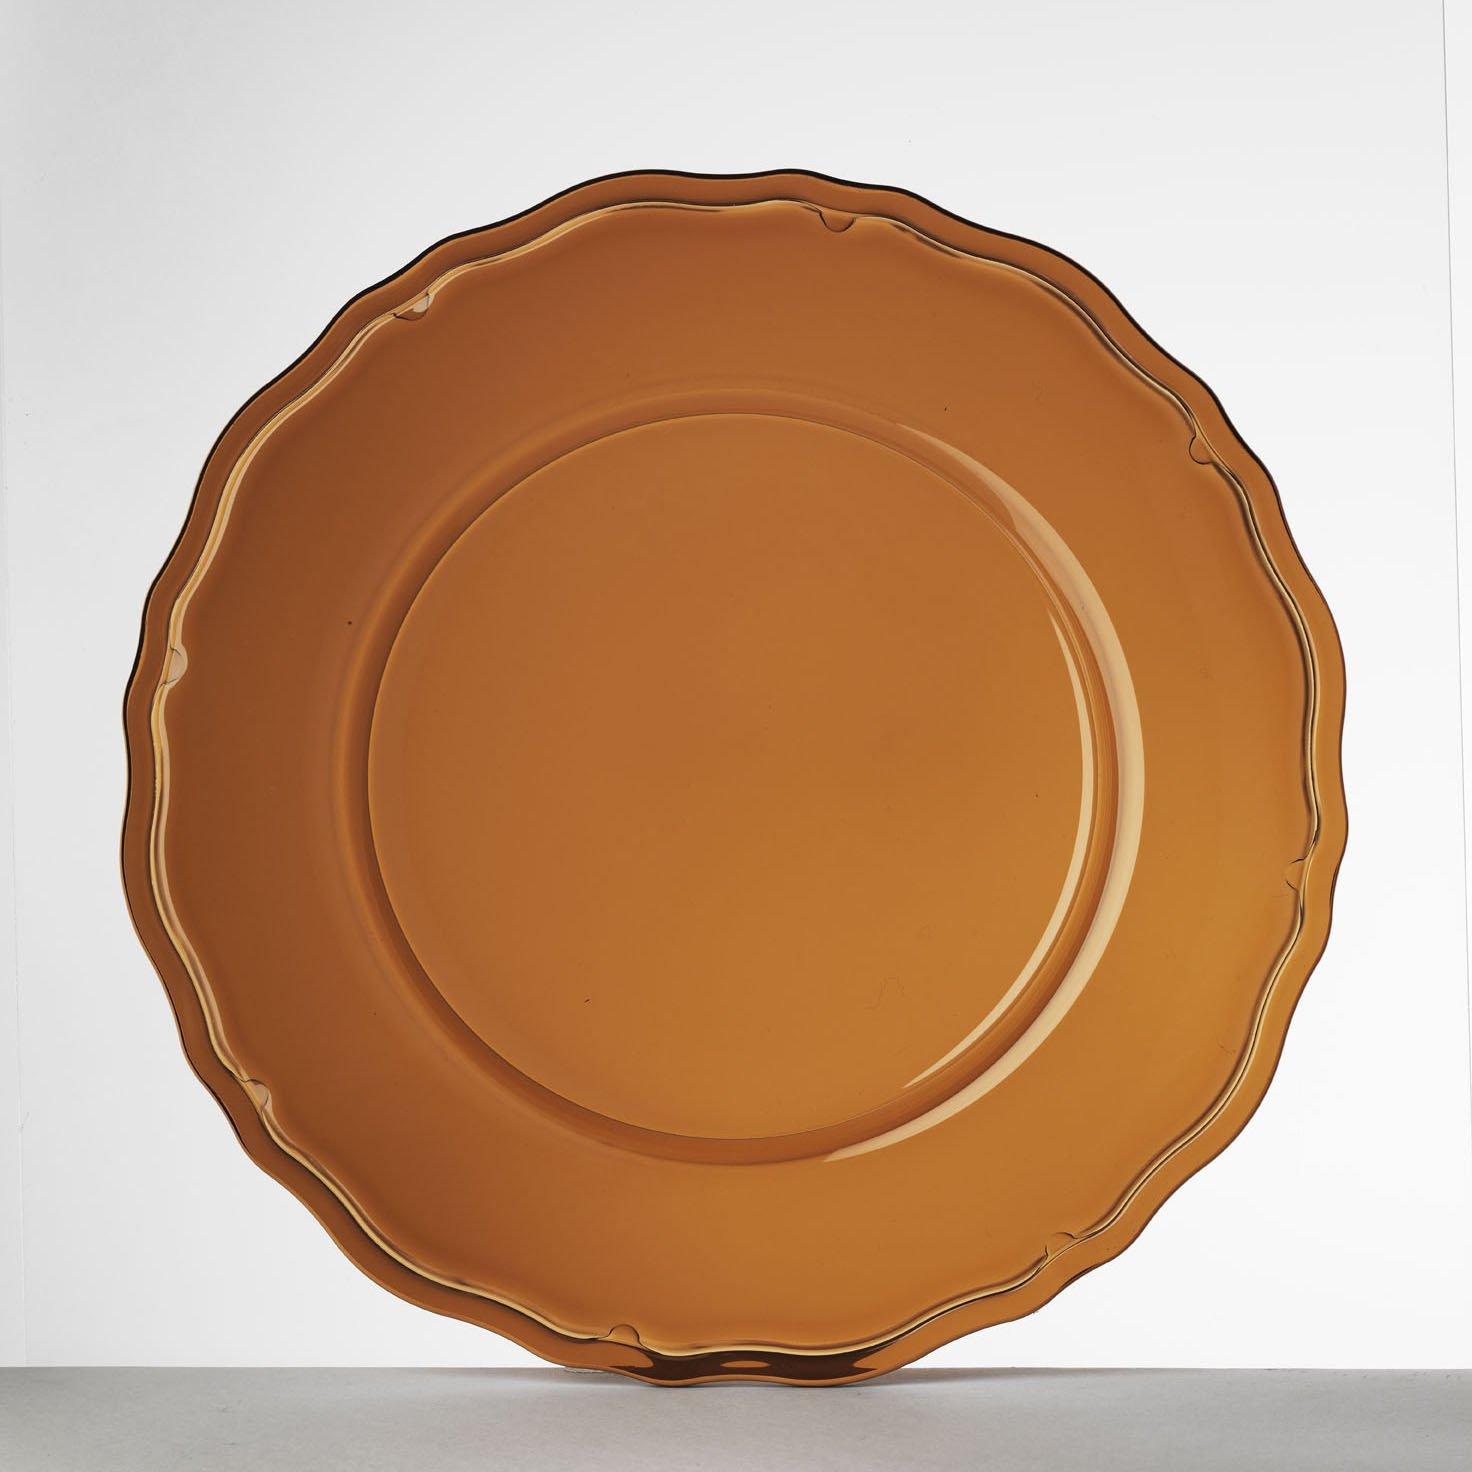 Mario Luca Giusti Set 6 Giotto Plate Amber by Mario Luca Giusti (Image #1)